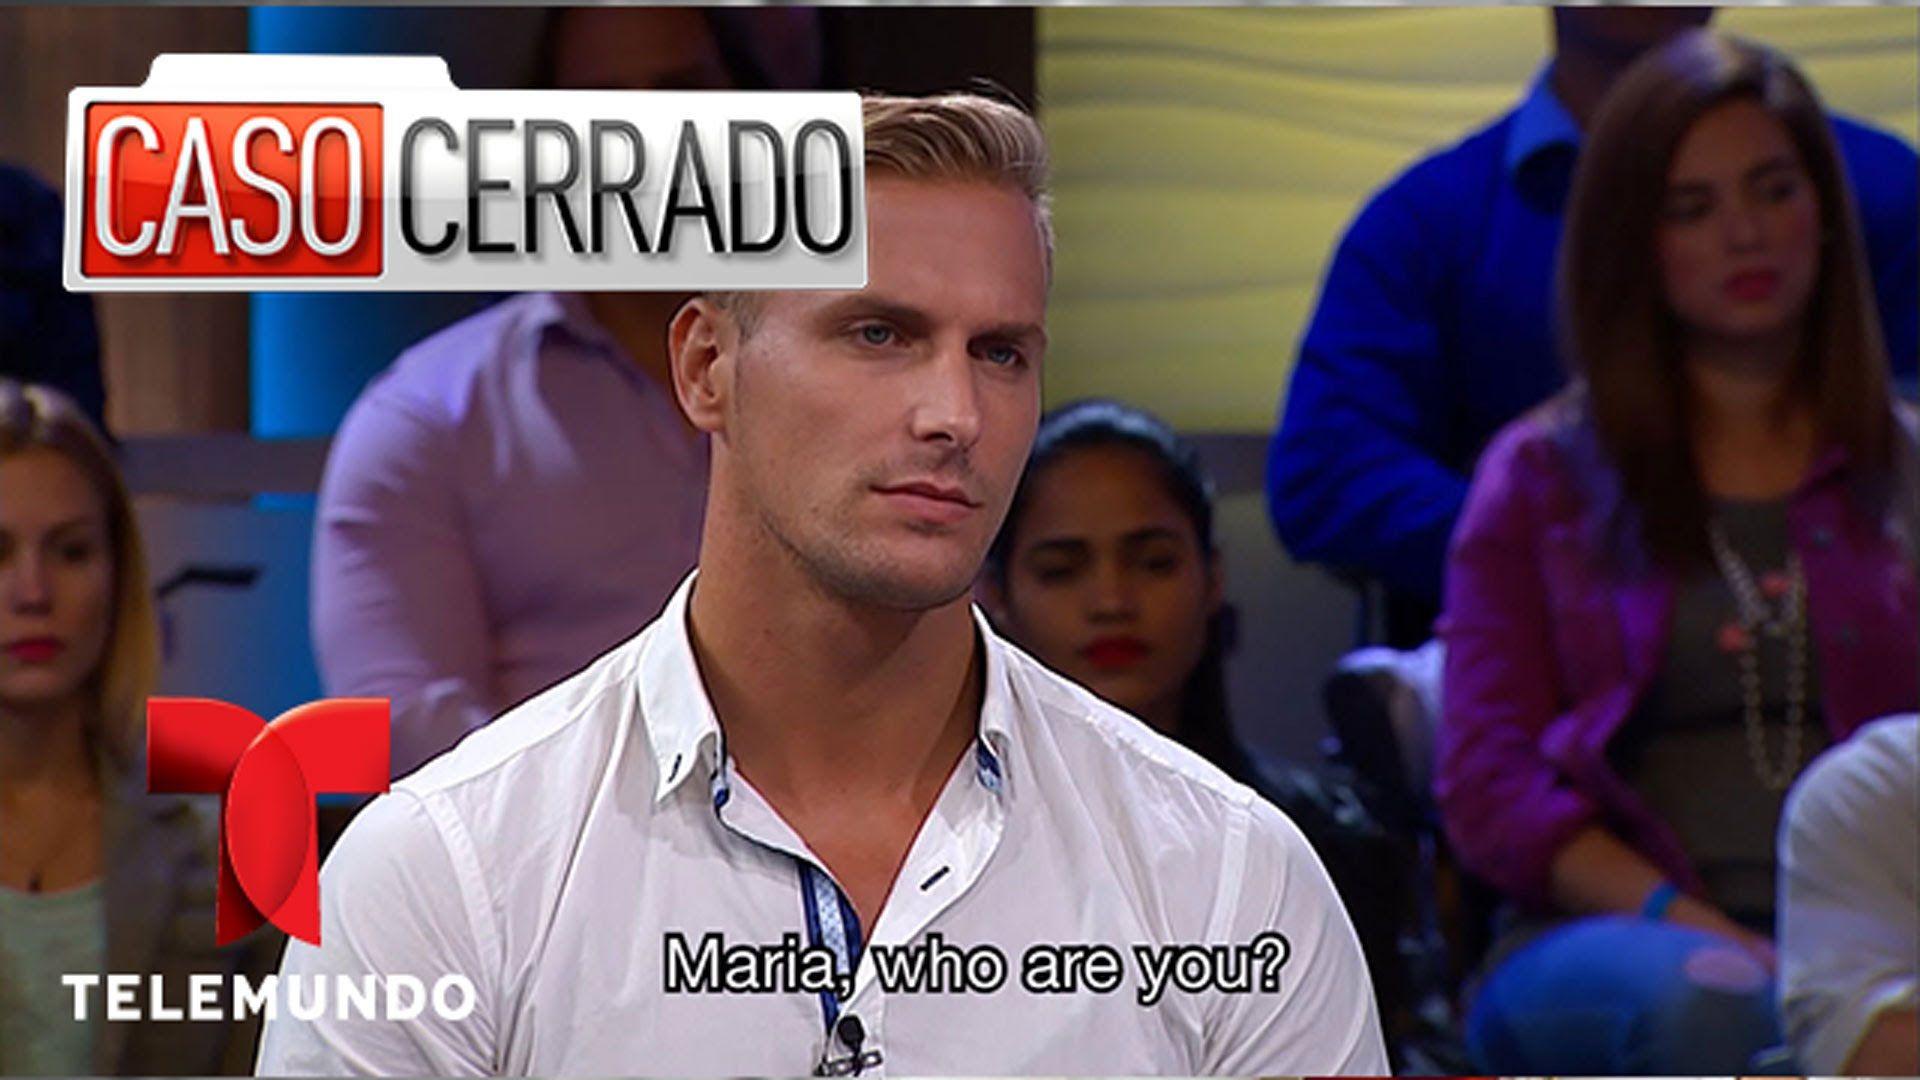 Caso Cerrado Full Episode | Fired For Having HIV | Telemundo